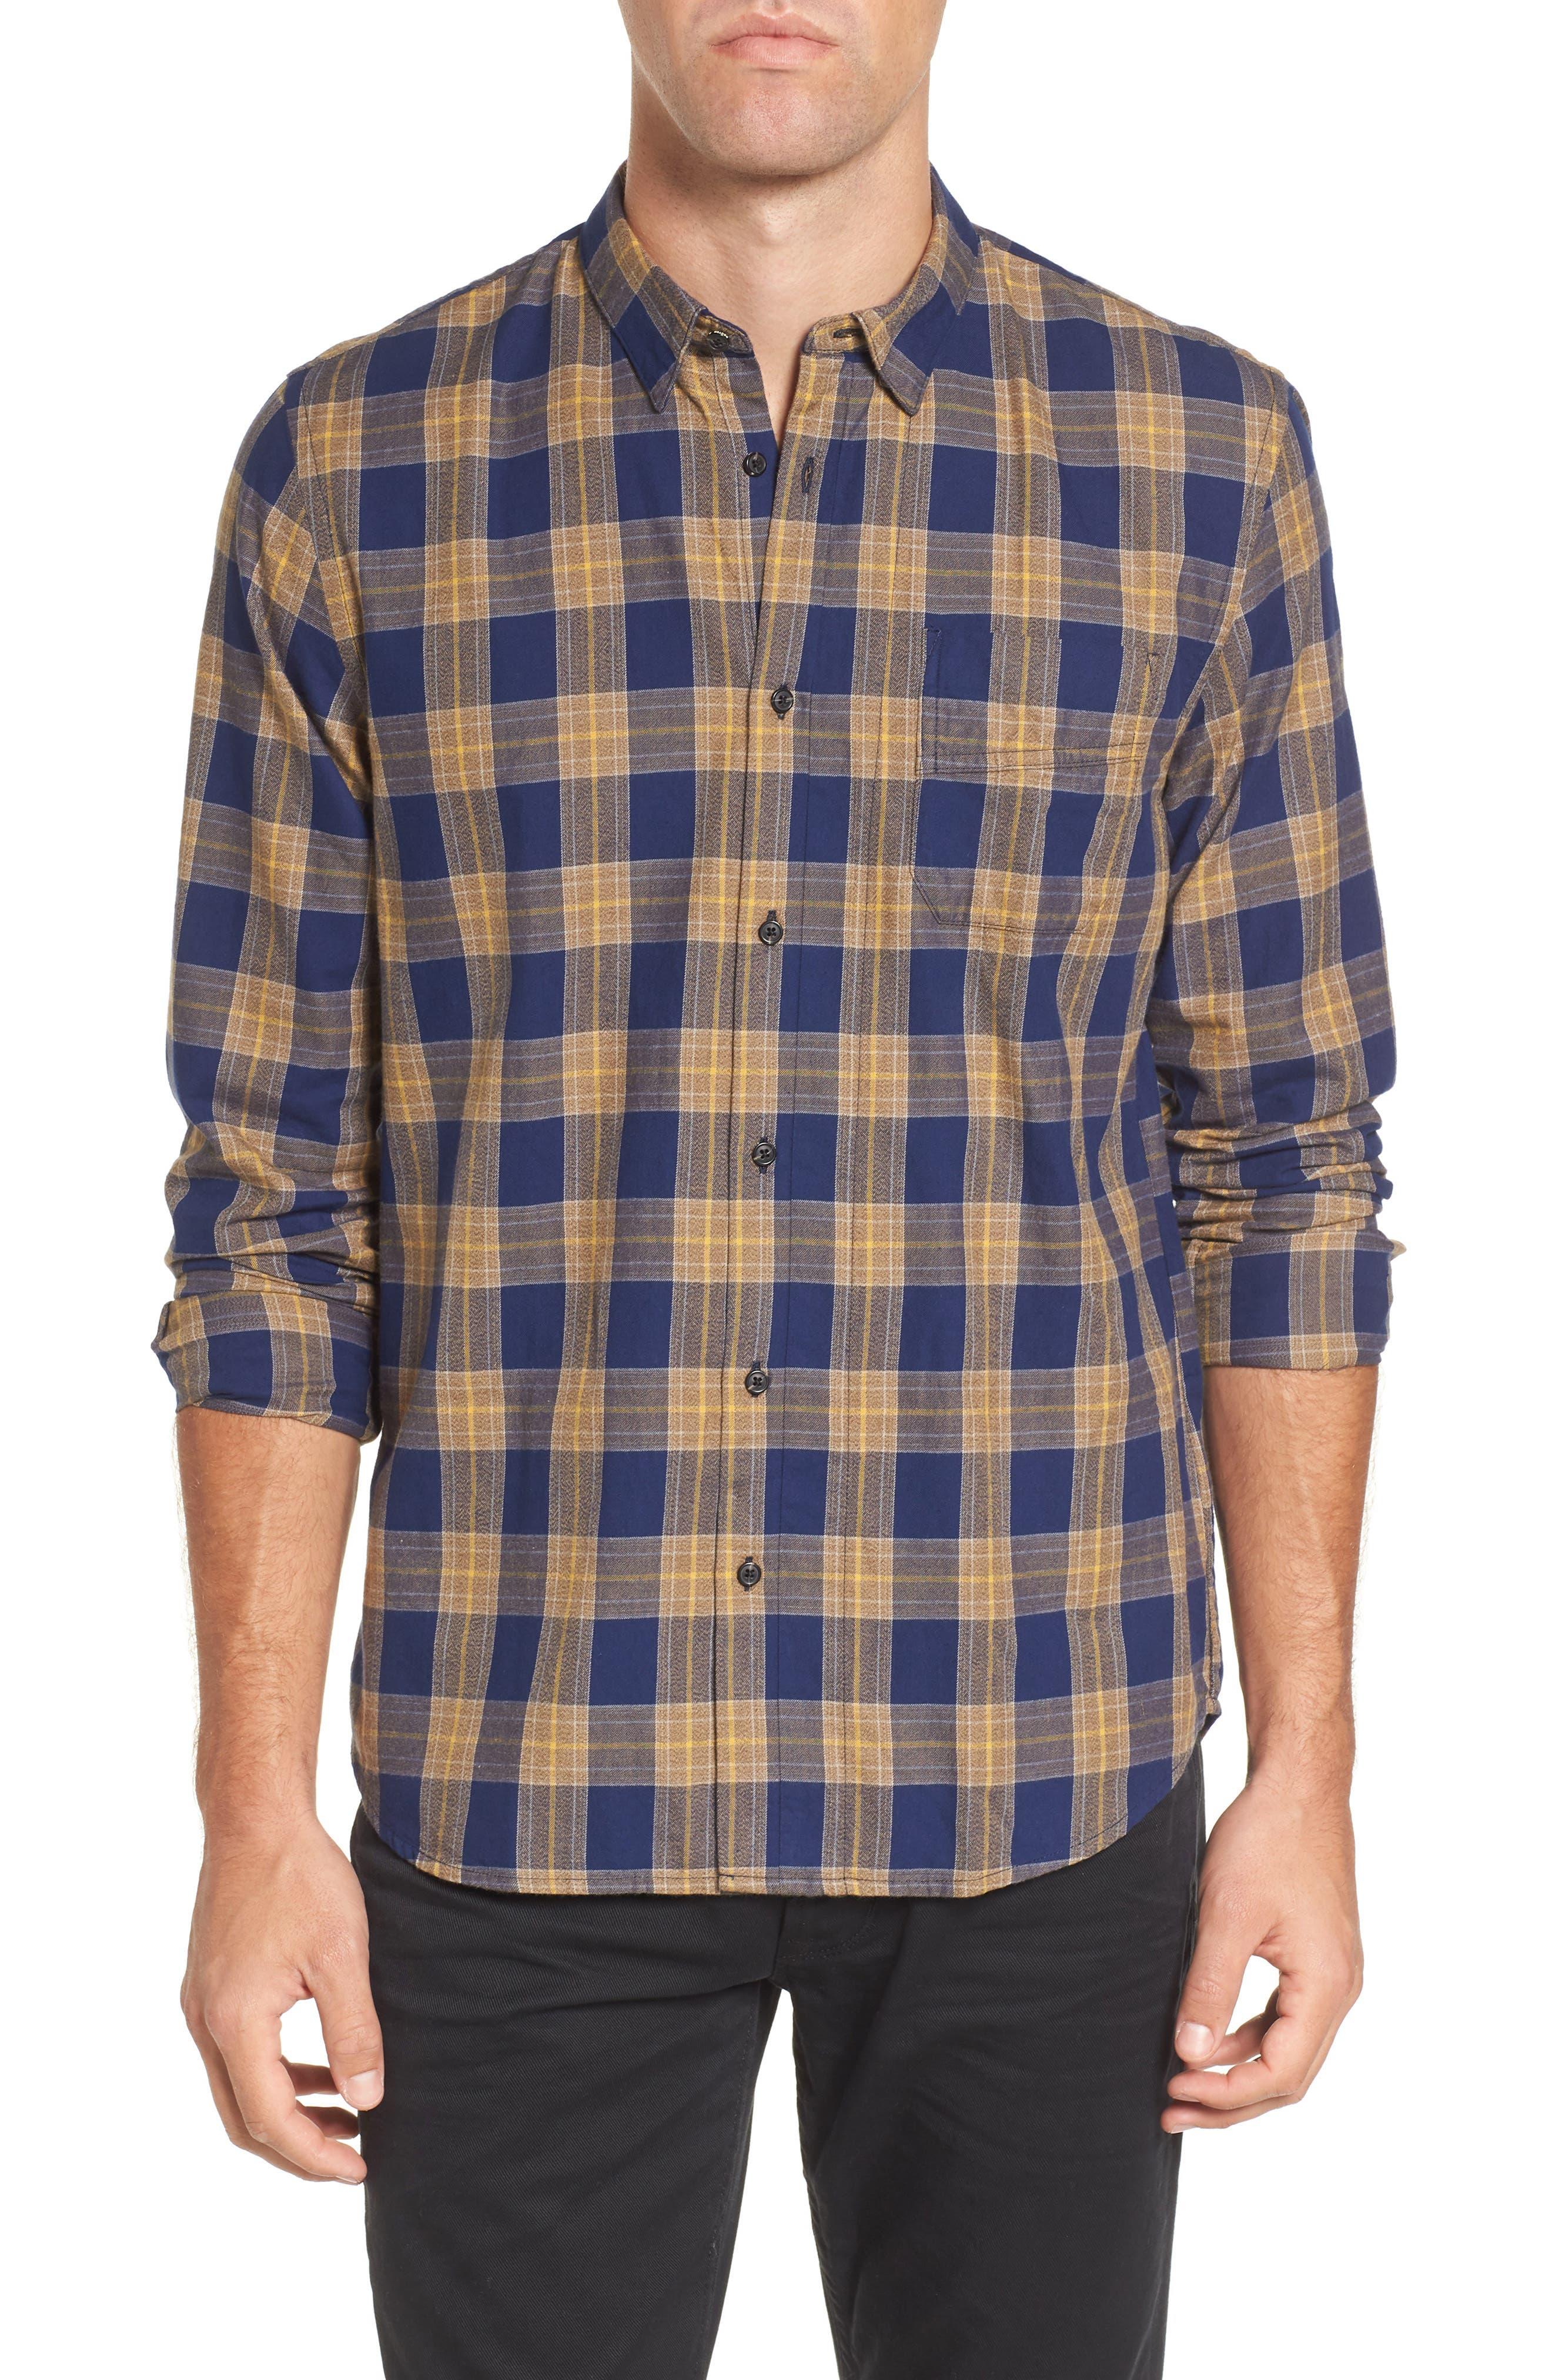 Scotch & Sode Brushed Cotton Shirt,                         Main,                         color, Blue